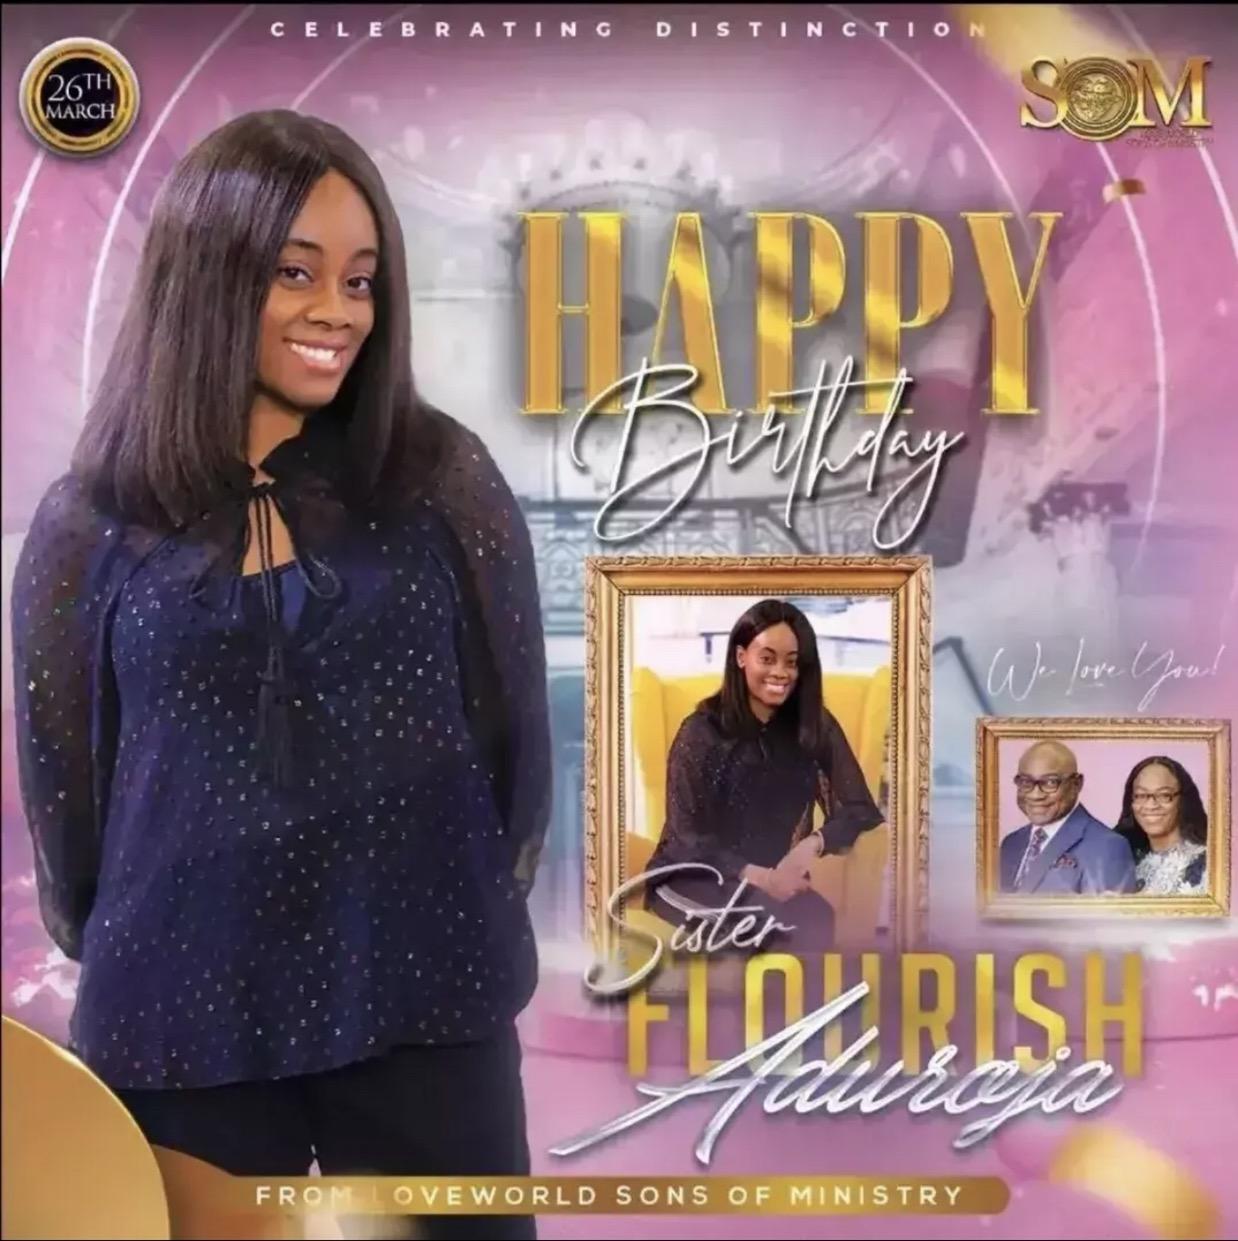 Happy birthday dear sis Flourish